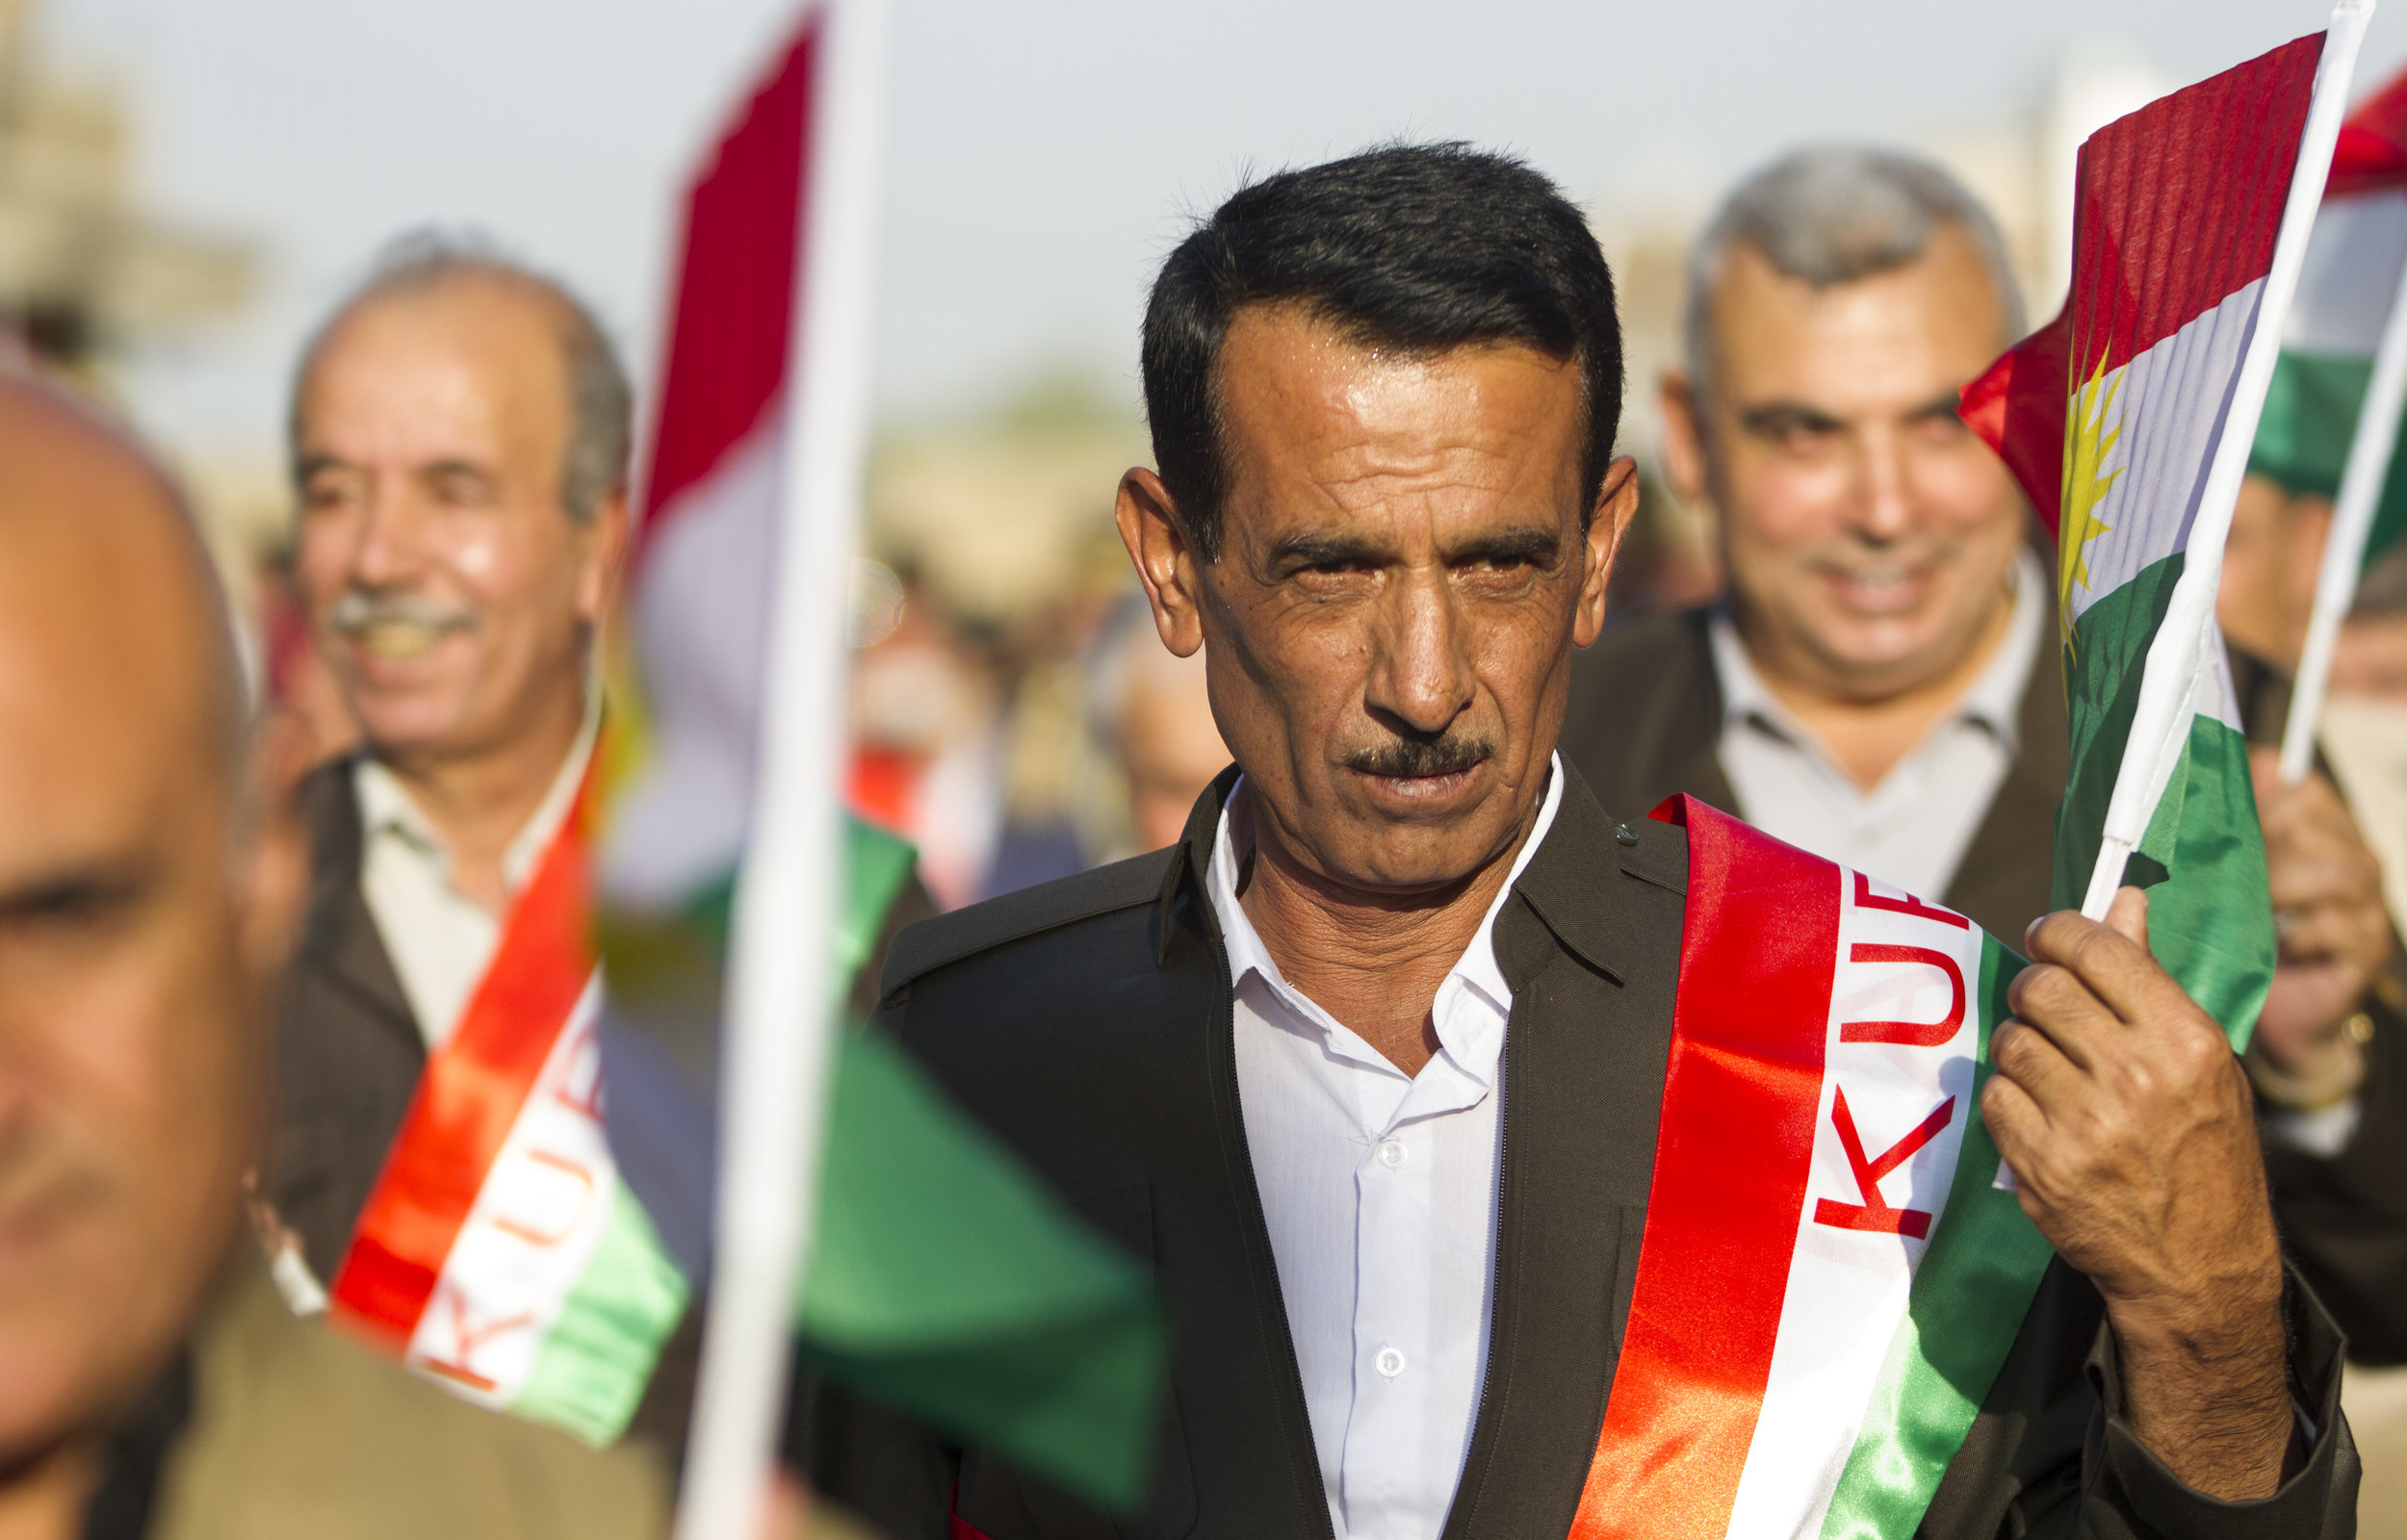 A parade through Erbil, Iraq ahead of the Kurdish independence referendum.